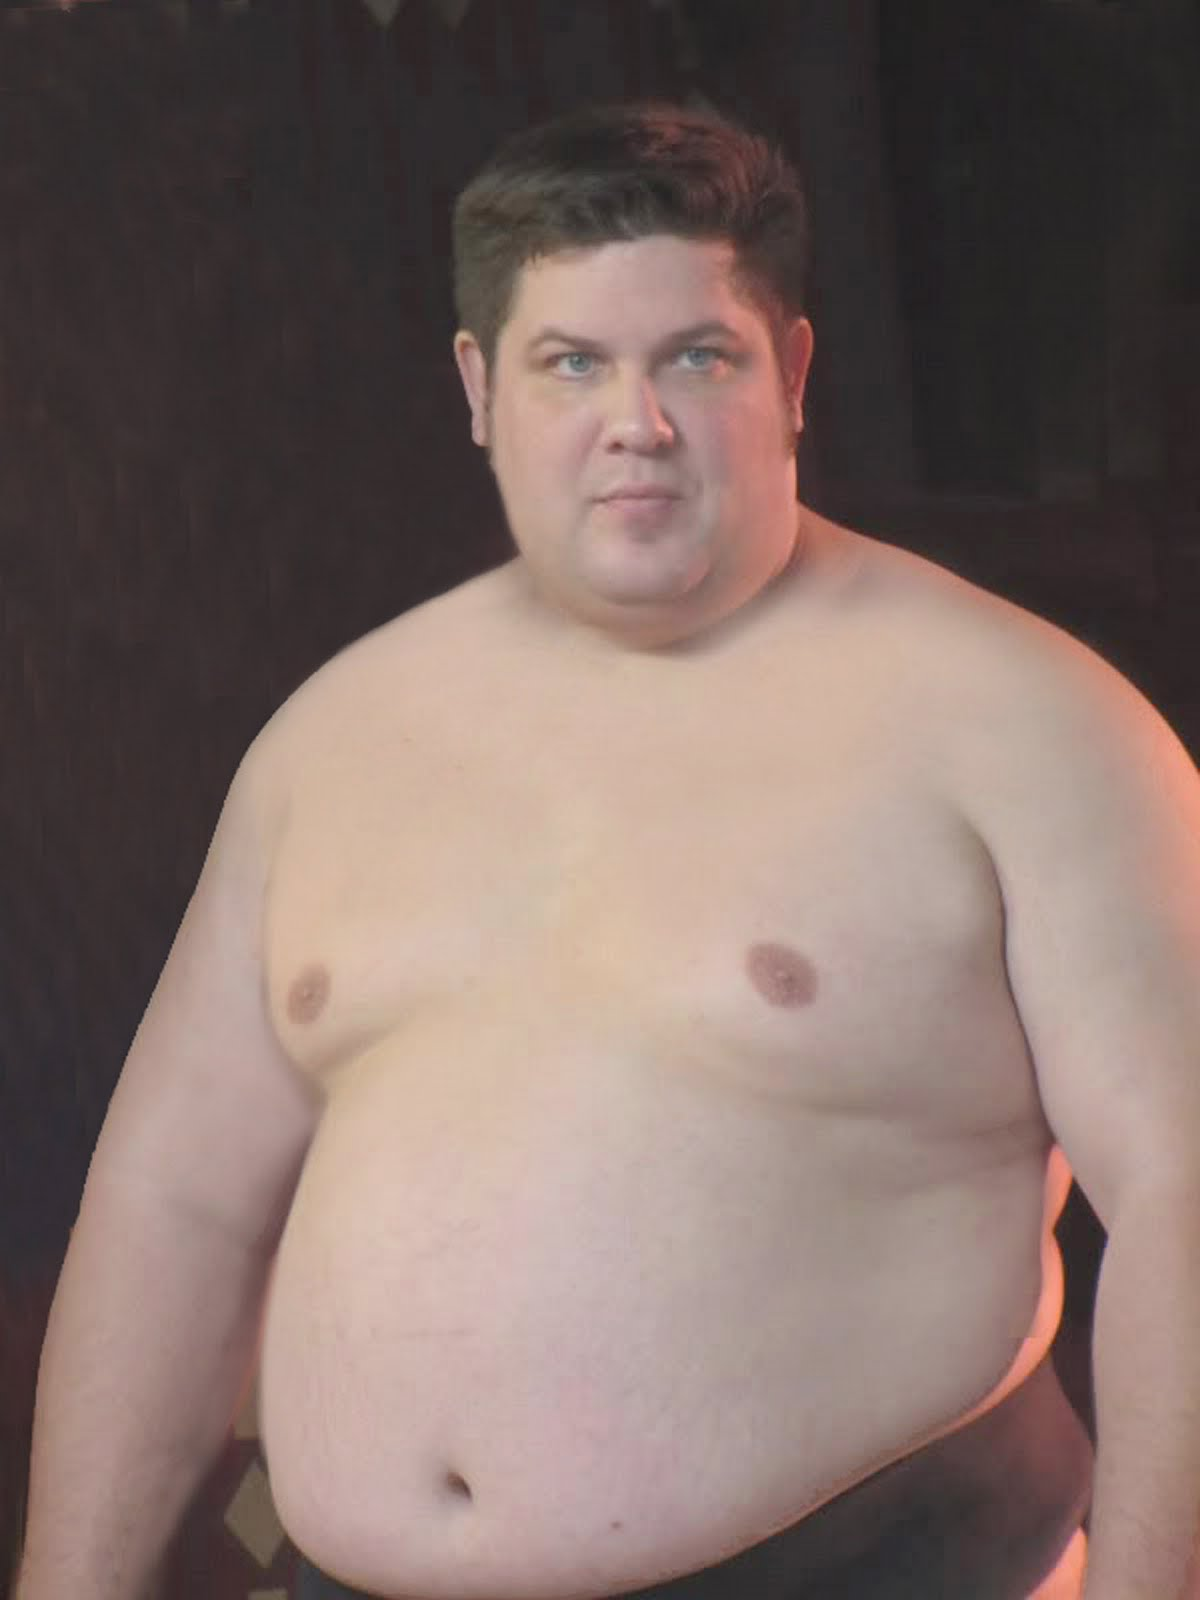 3gpporn fat man video sex woman